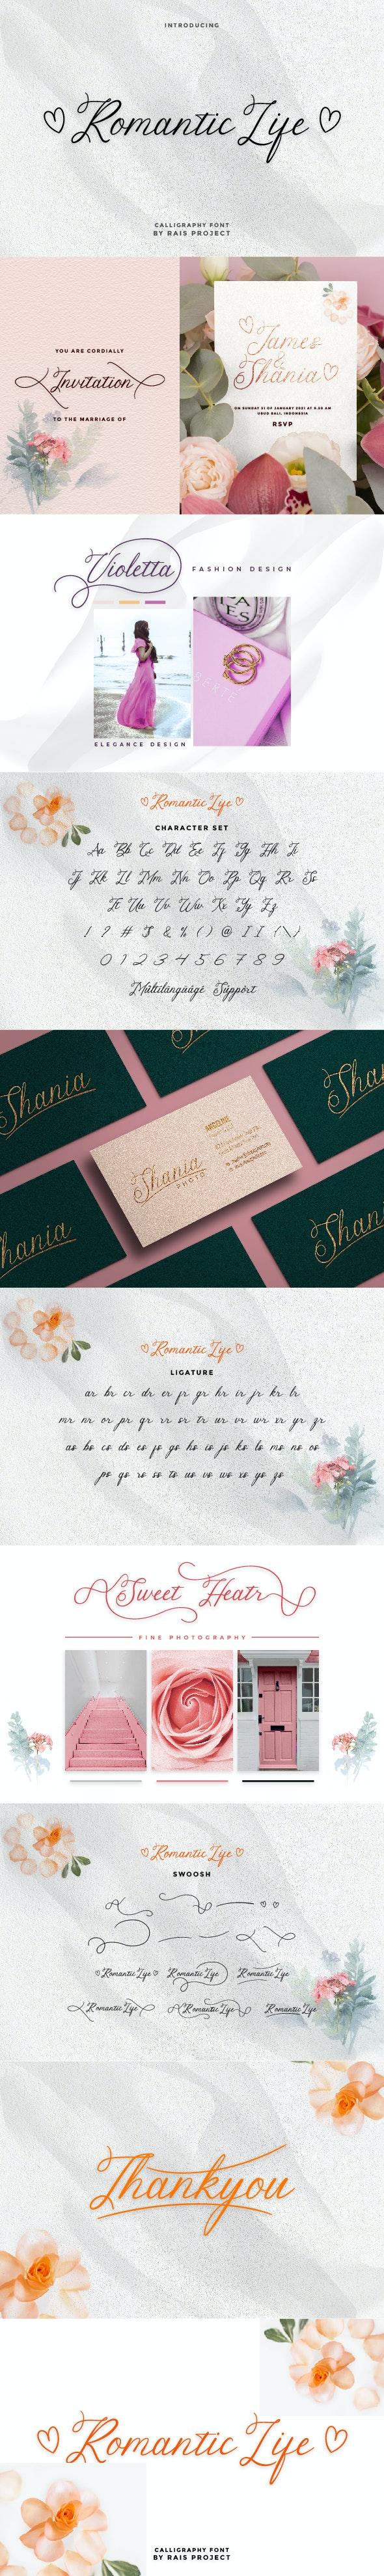 Romantic Life Handwriting Font - Hand-writing Script